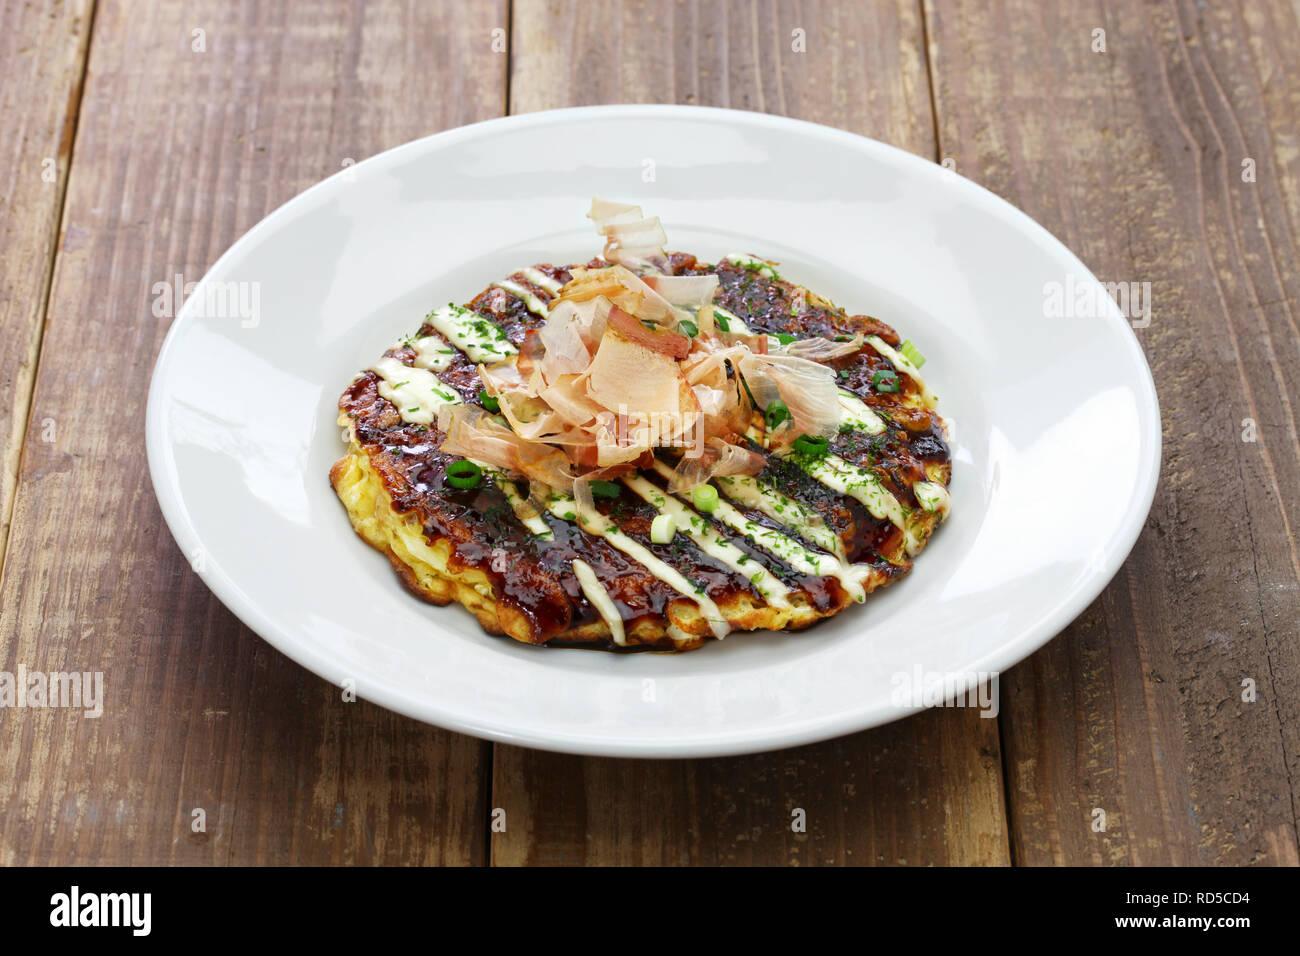 Okonomiyaki is a Japanese savory pancake containing a variety of ingredients. - Stock Image